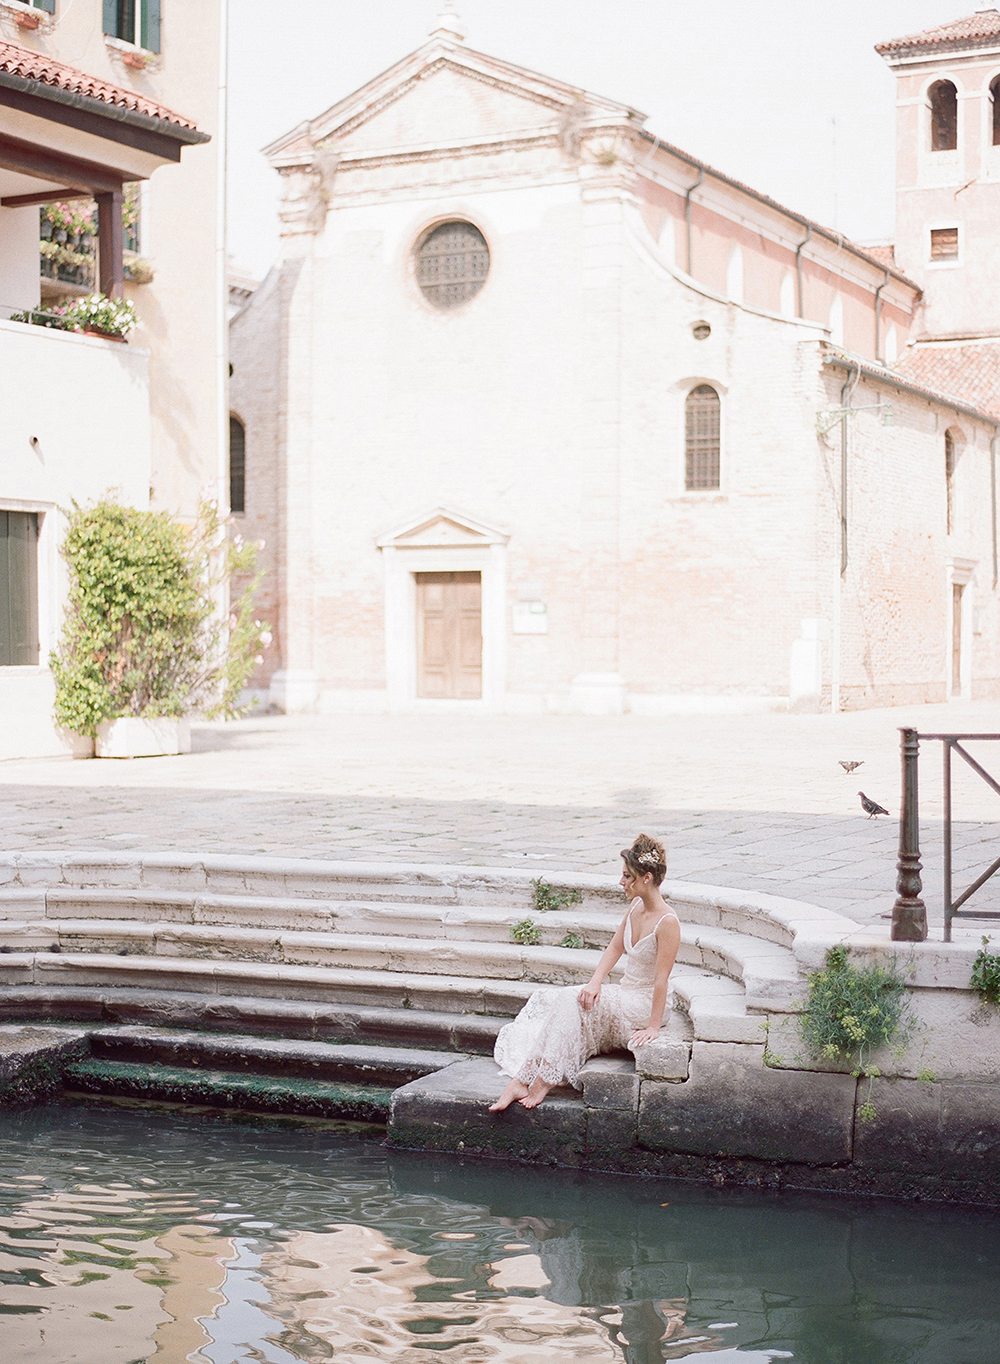 050_Venice.jpg